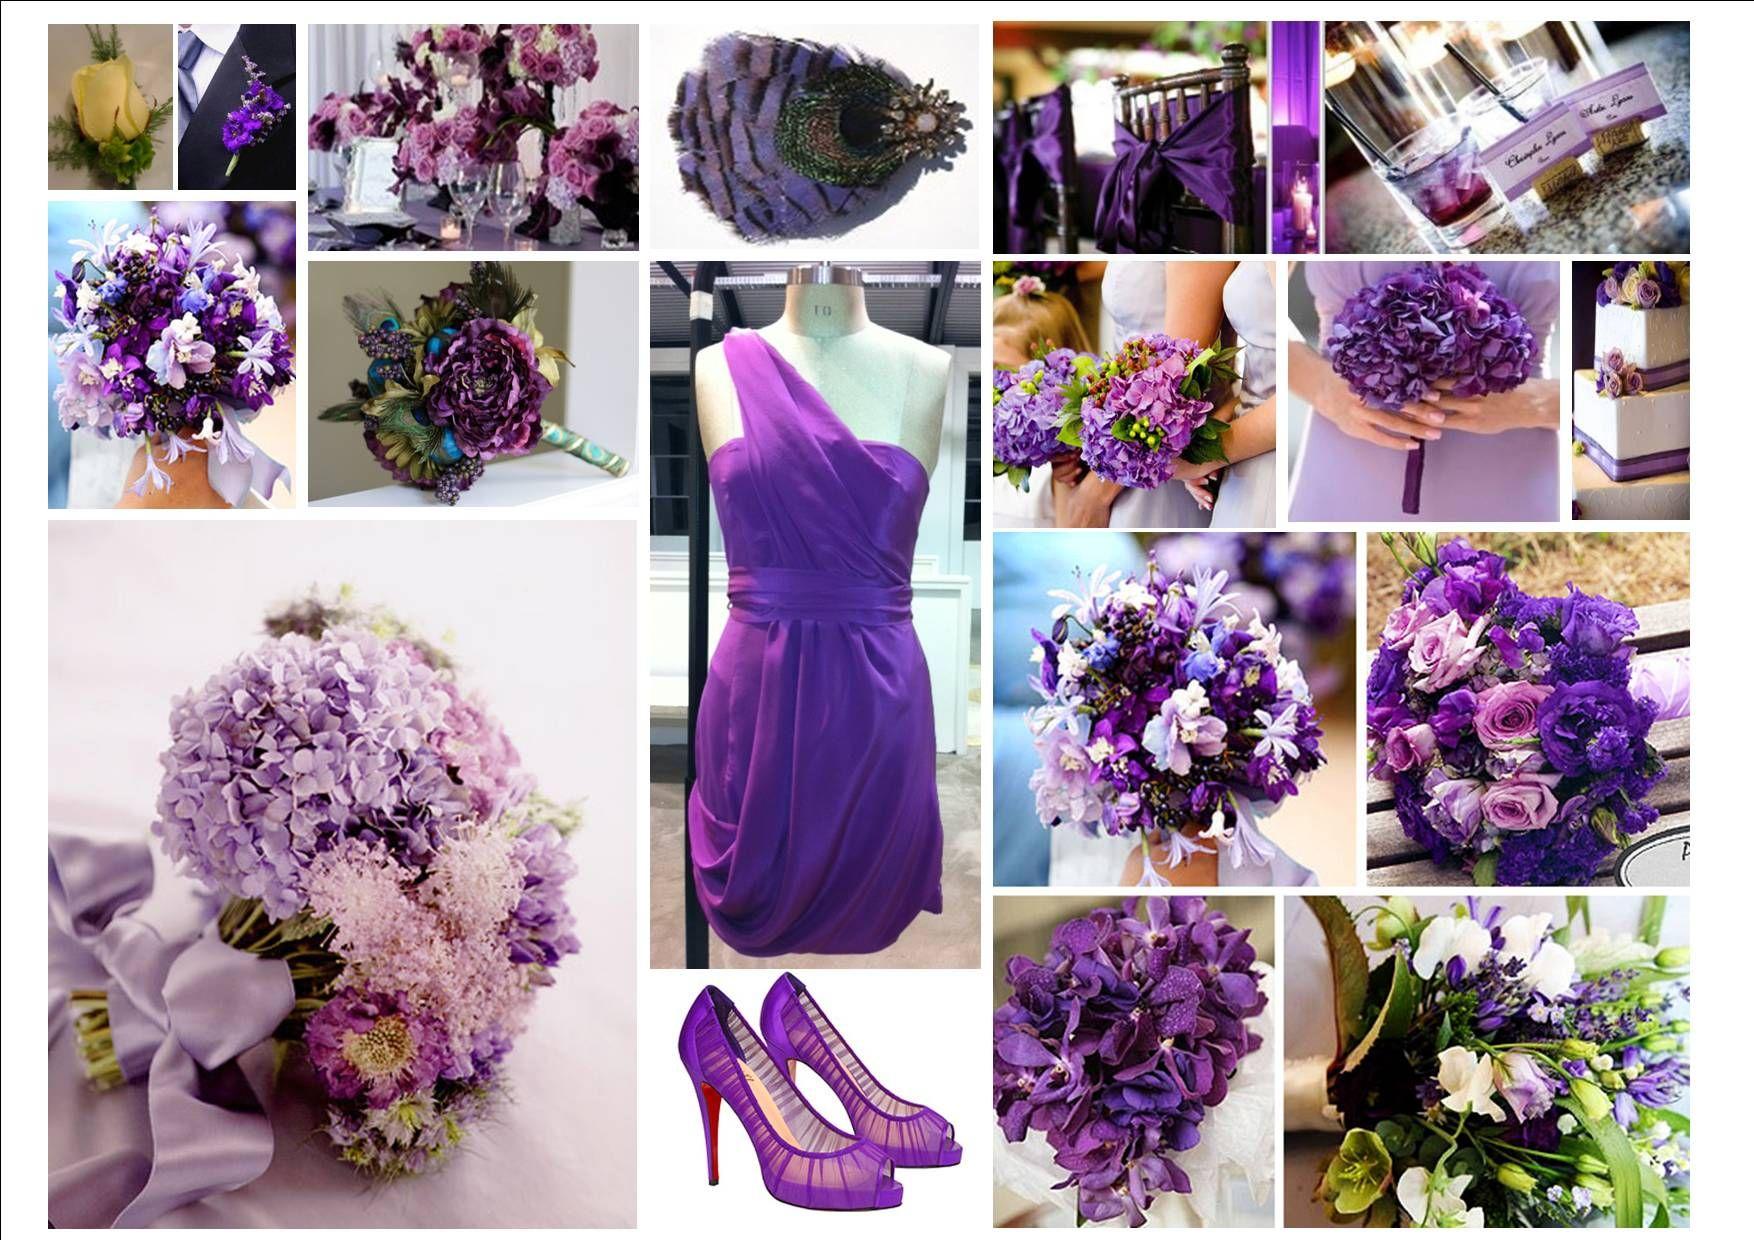 Purple Wedding Ideas Wallpaper Decorations Pinterest Concepts